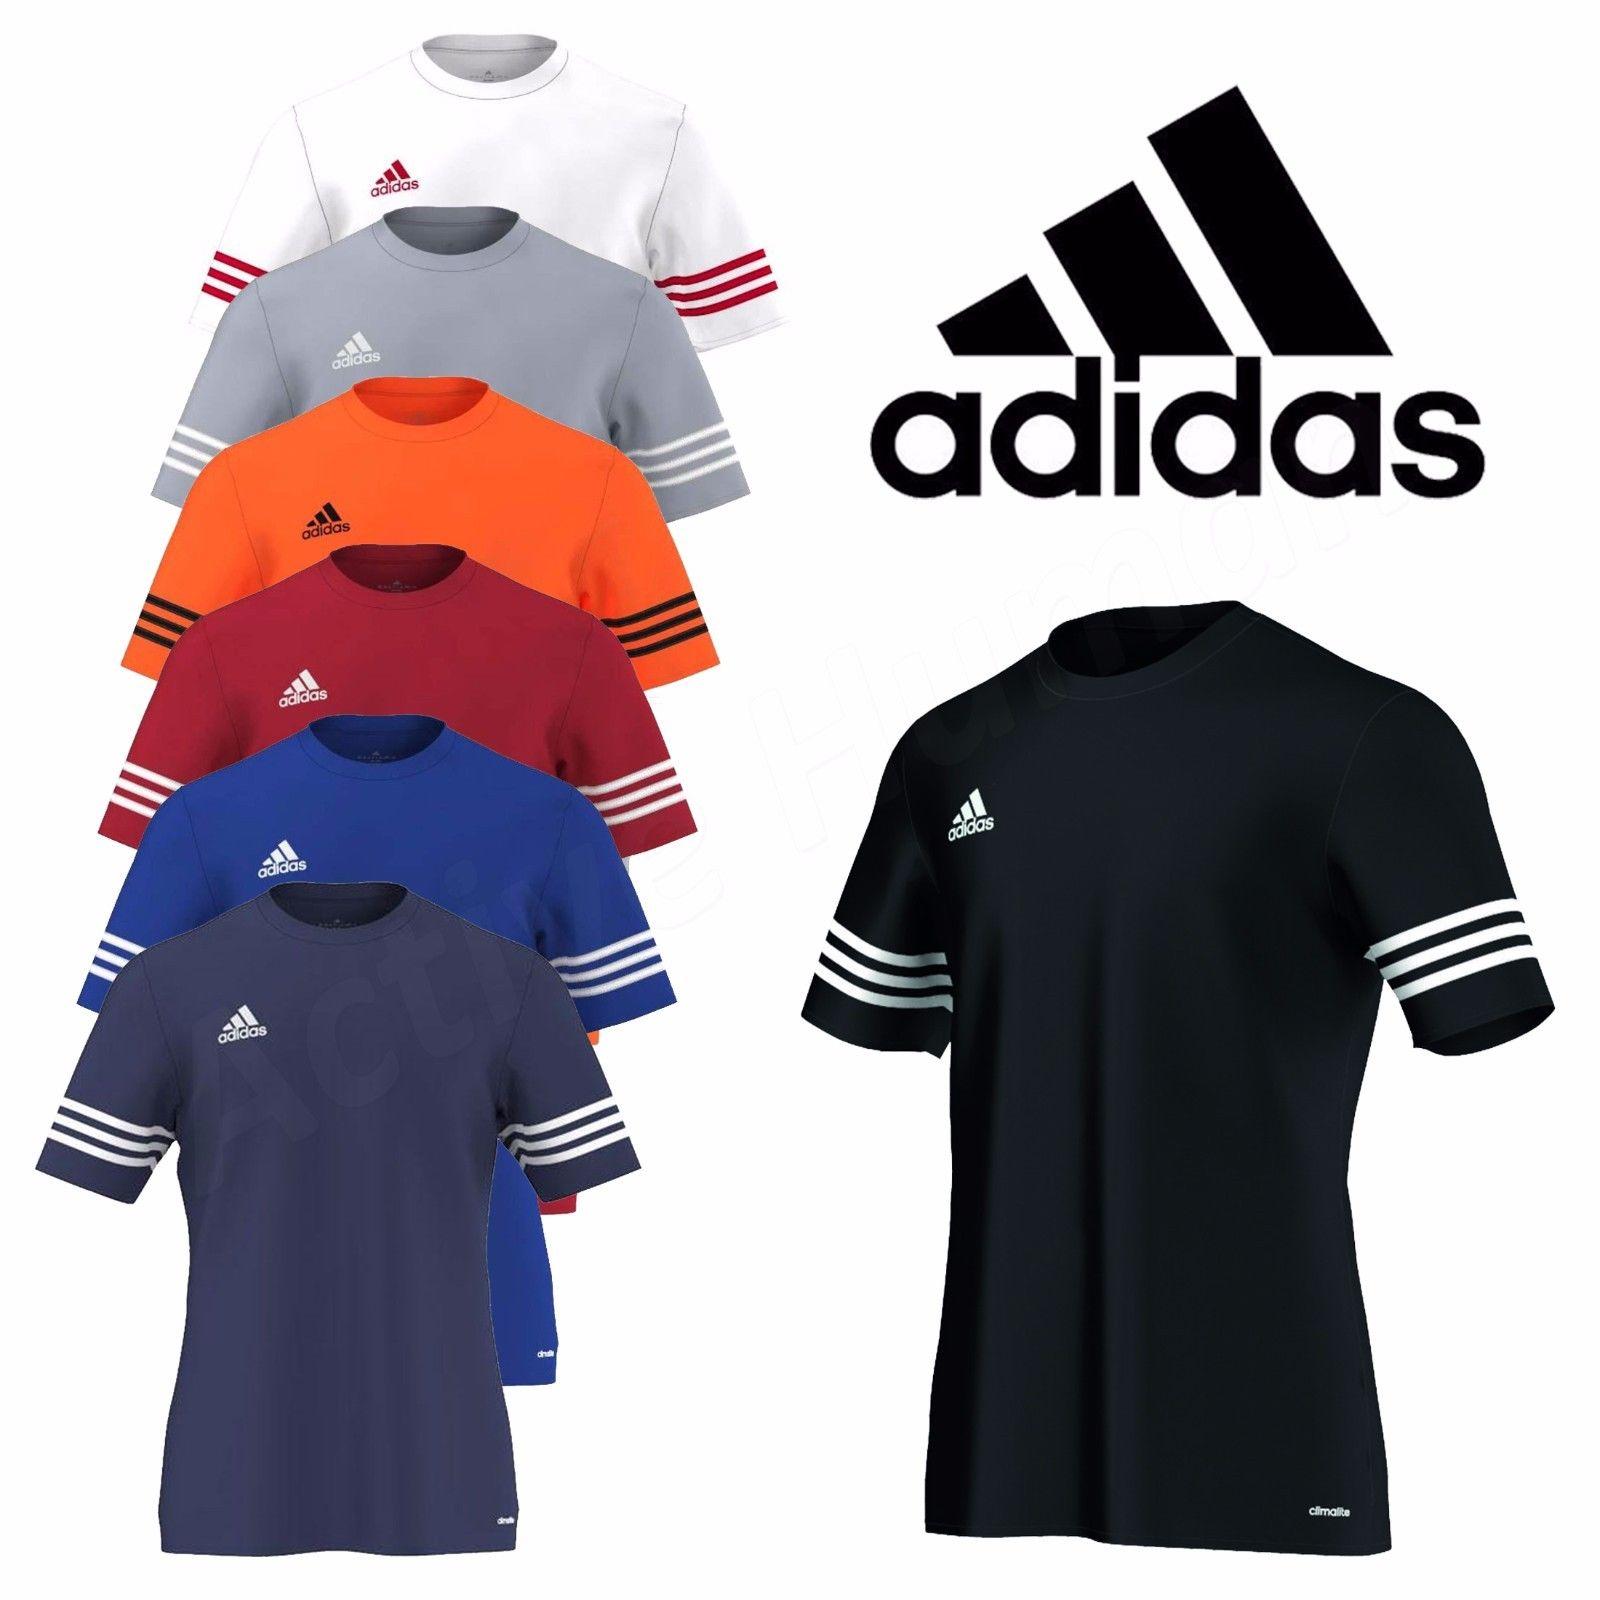 Adidas Mens T Shirt Football Training Top Gym Climalite Entrada Size M L XL  XXL 652a85b414